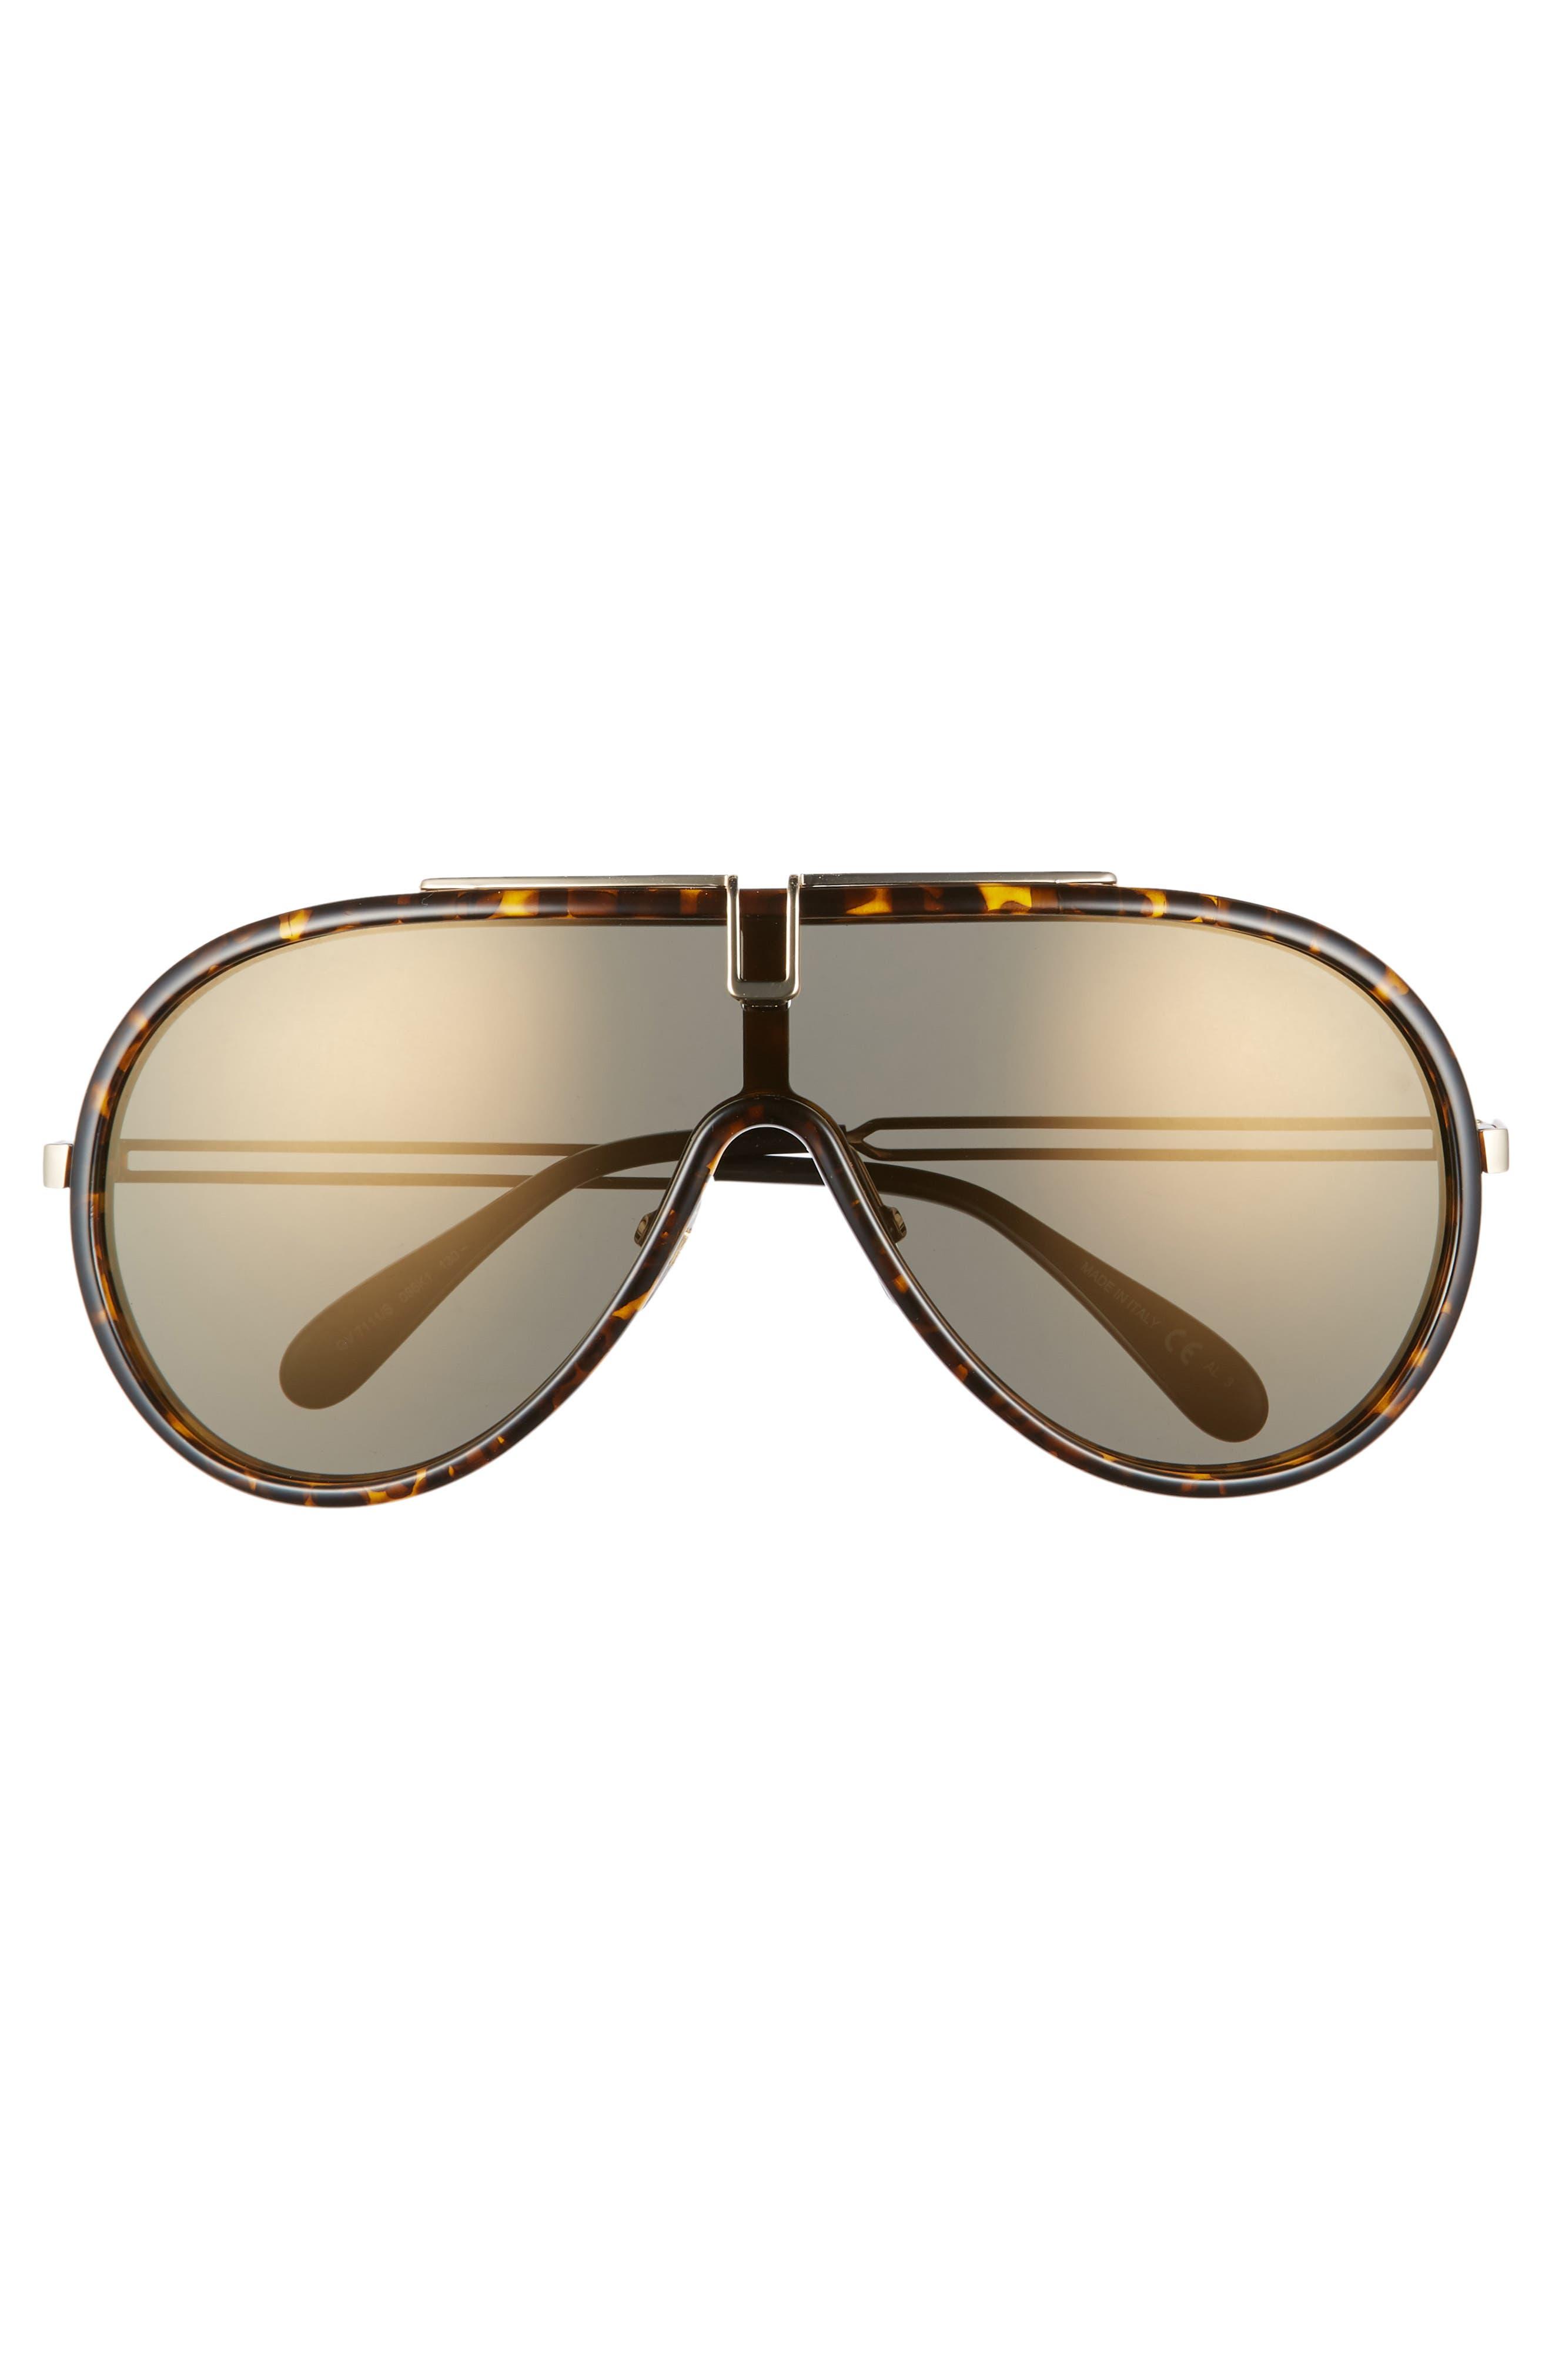 99mm Shield Sunglasses,                             Alternate thumbnail 3, color,                             DARK HAVANA